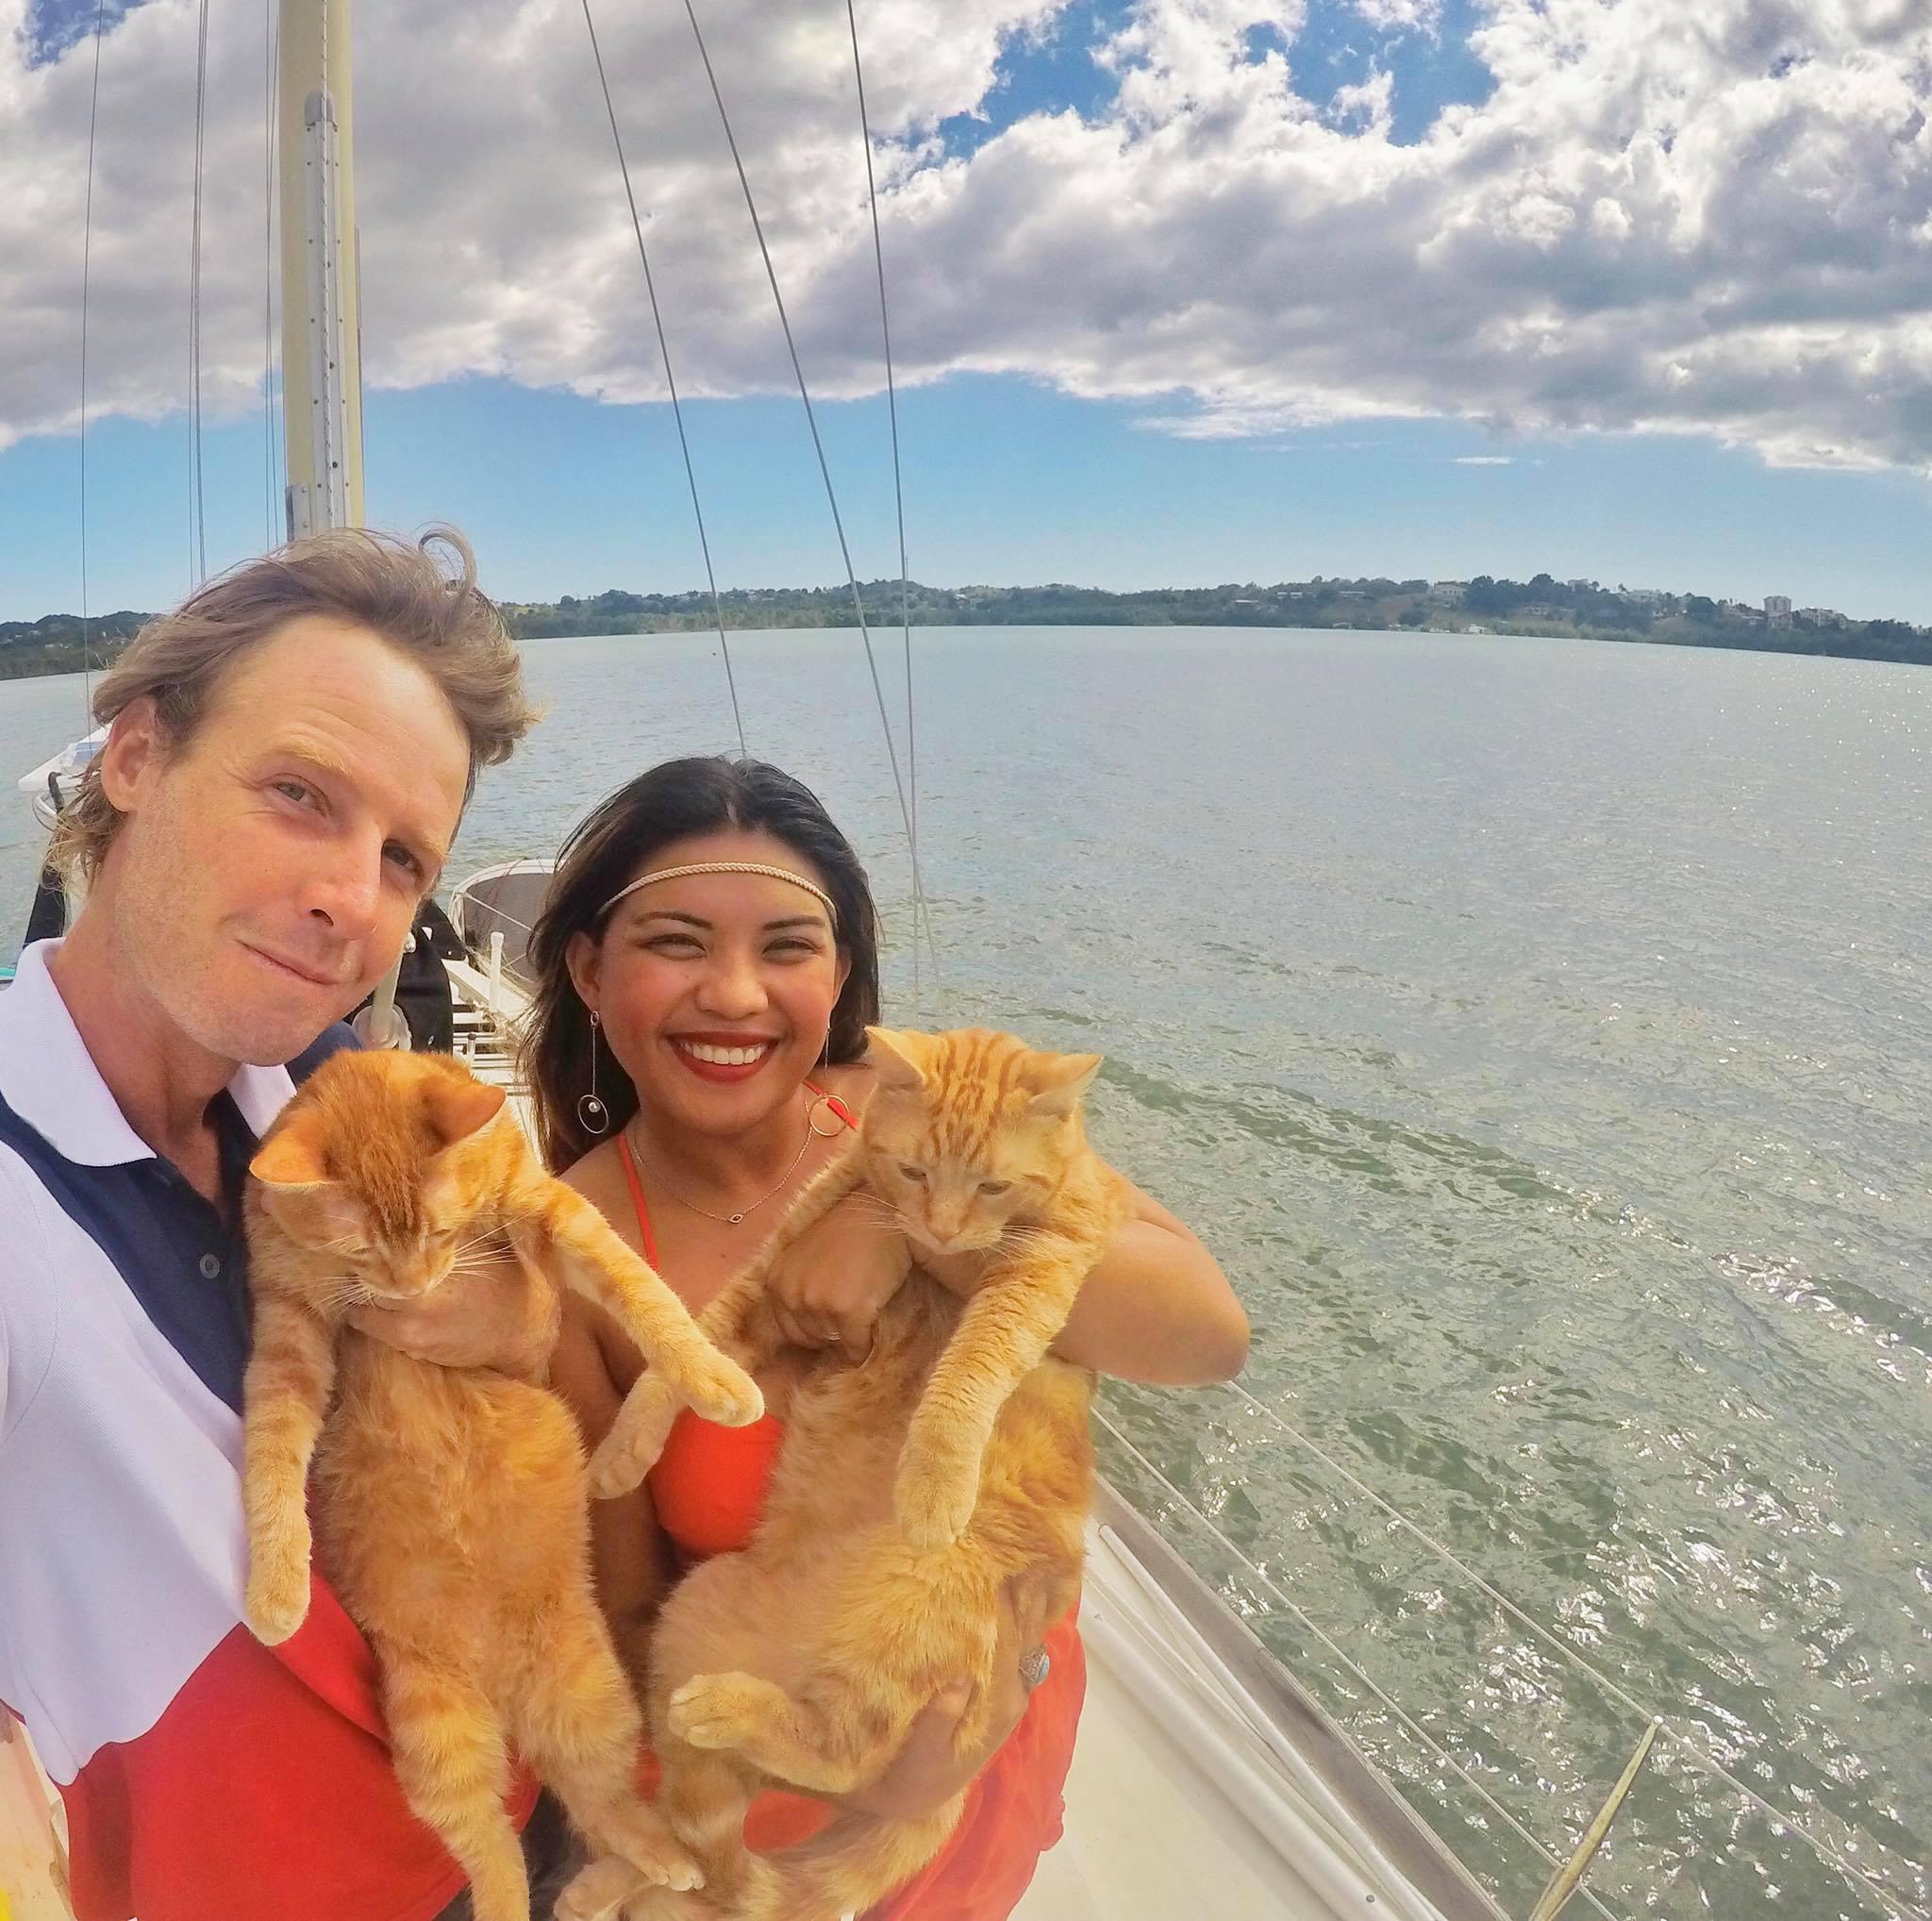 Sailing Life Day 305 Celebrating Christmas with fellow cruisers7.jpg